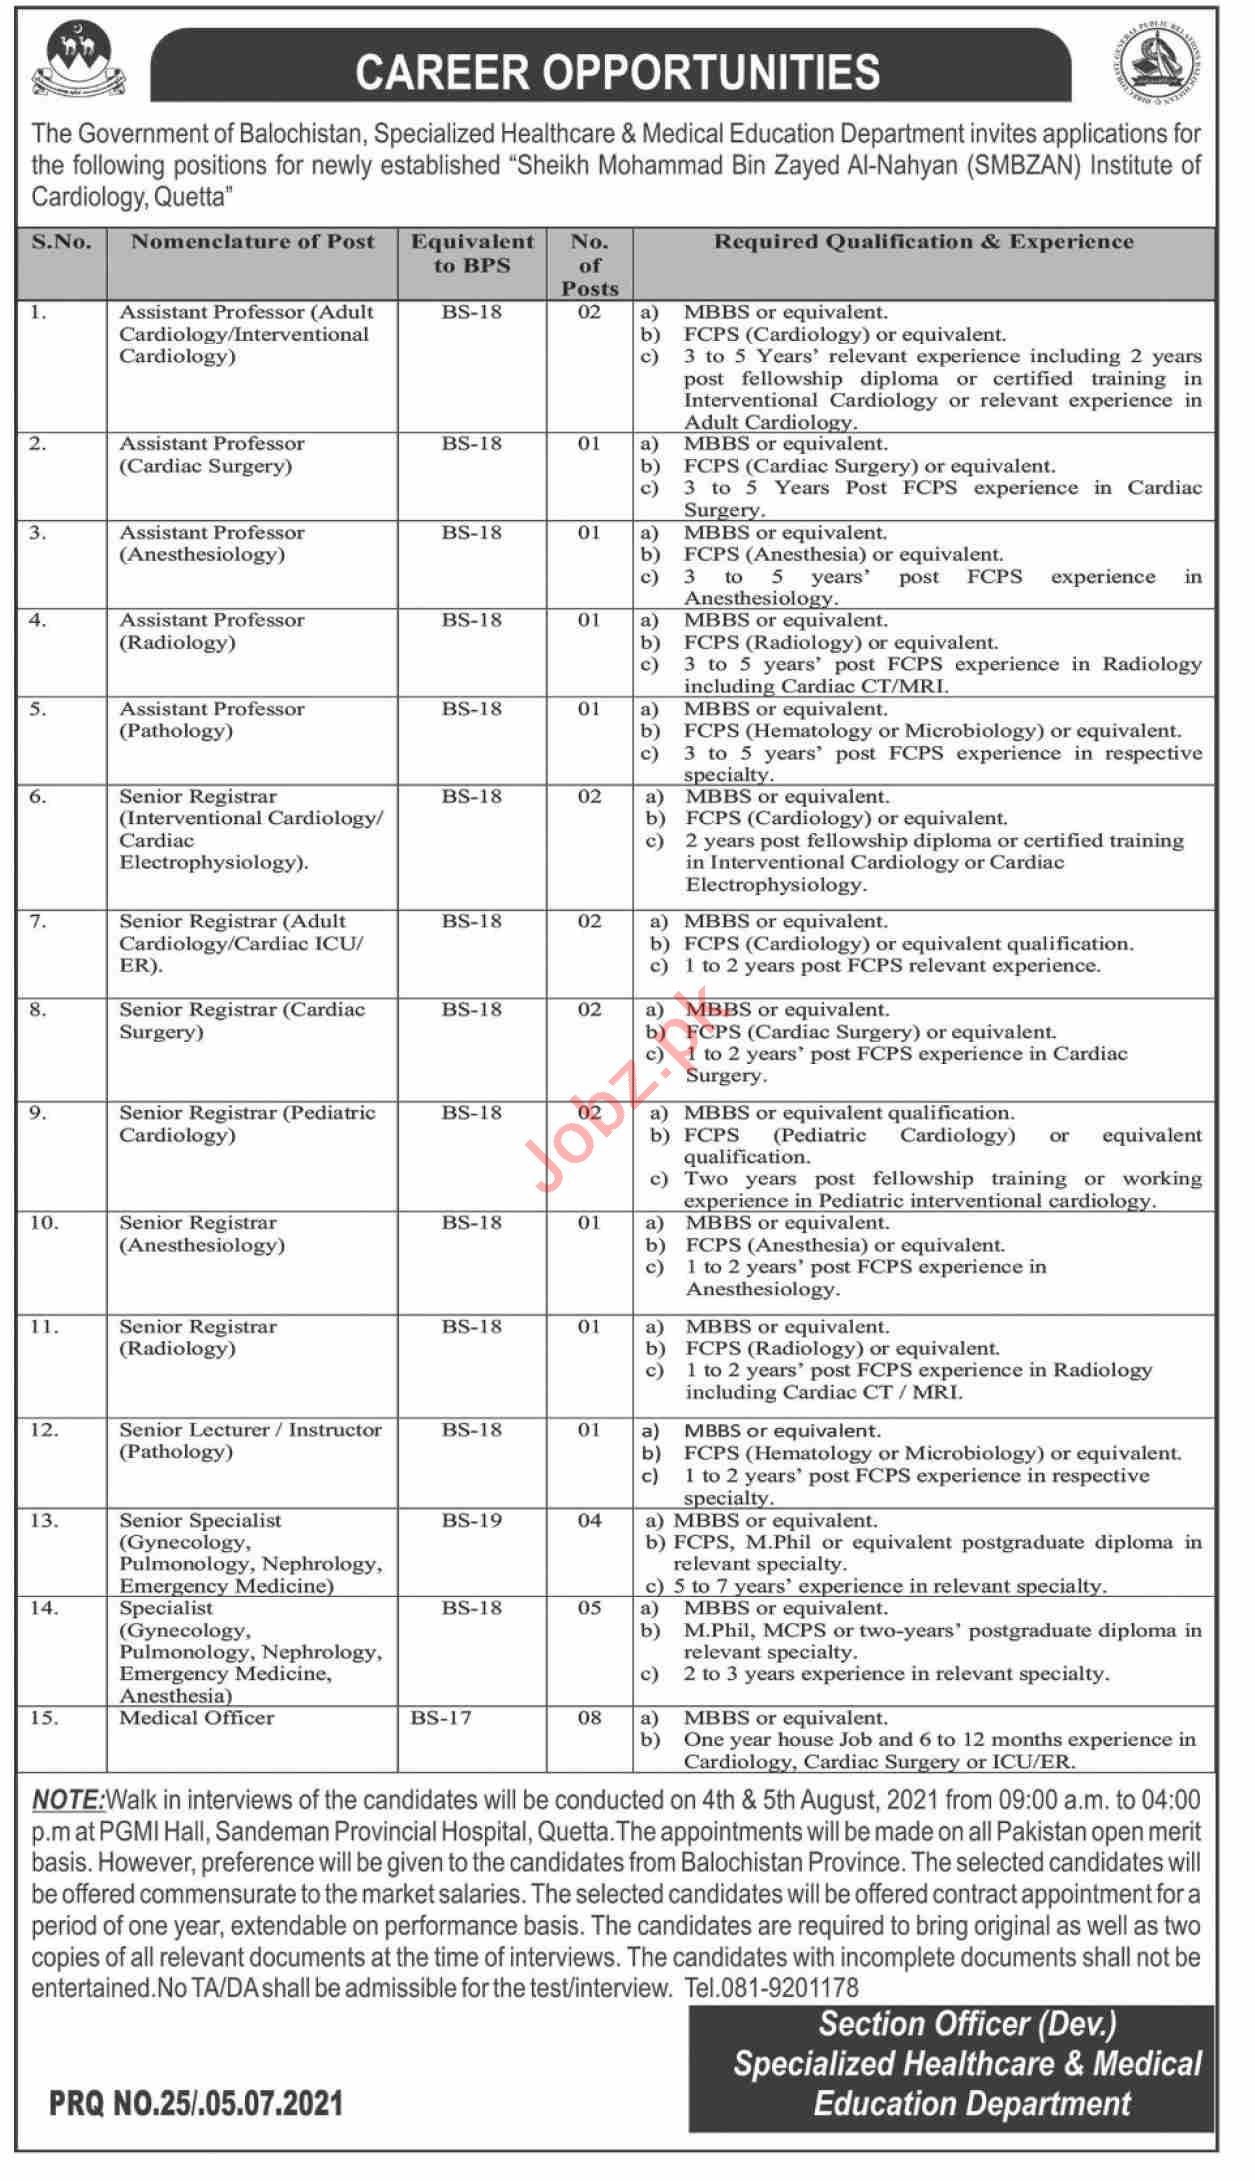 SMBZAN Institute of Cardiology Quetta Faculty Jobs 2021